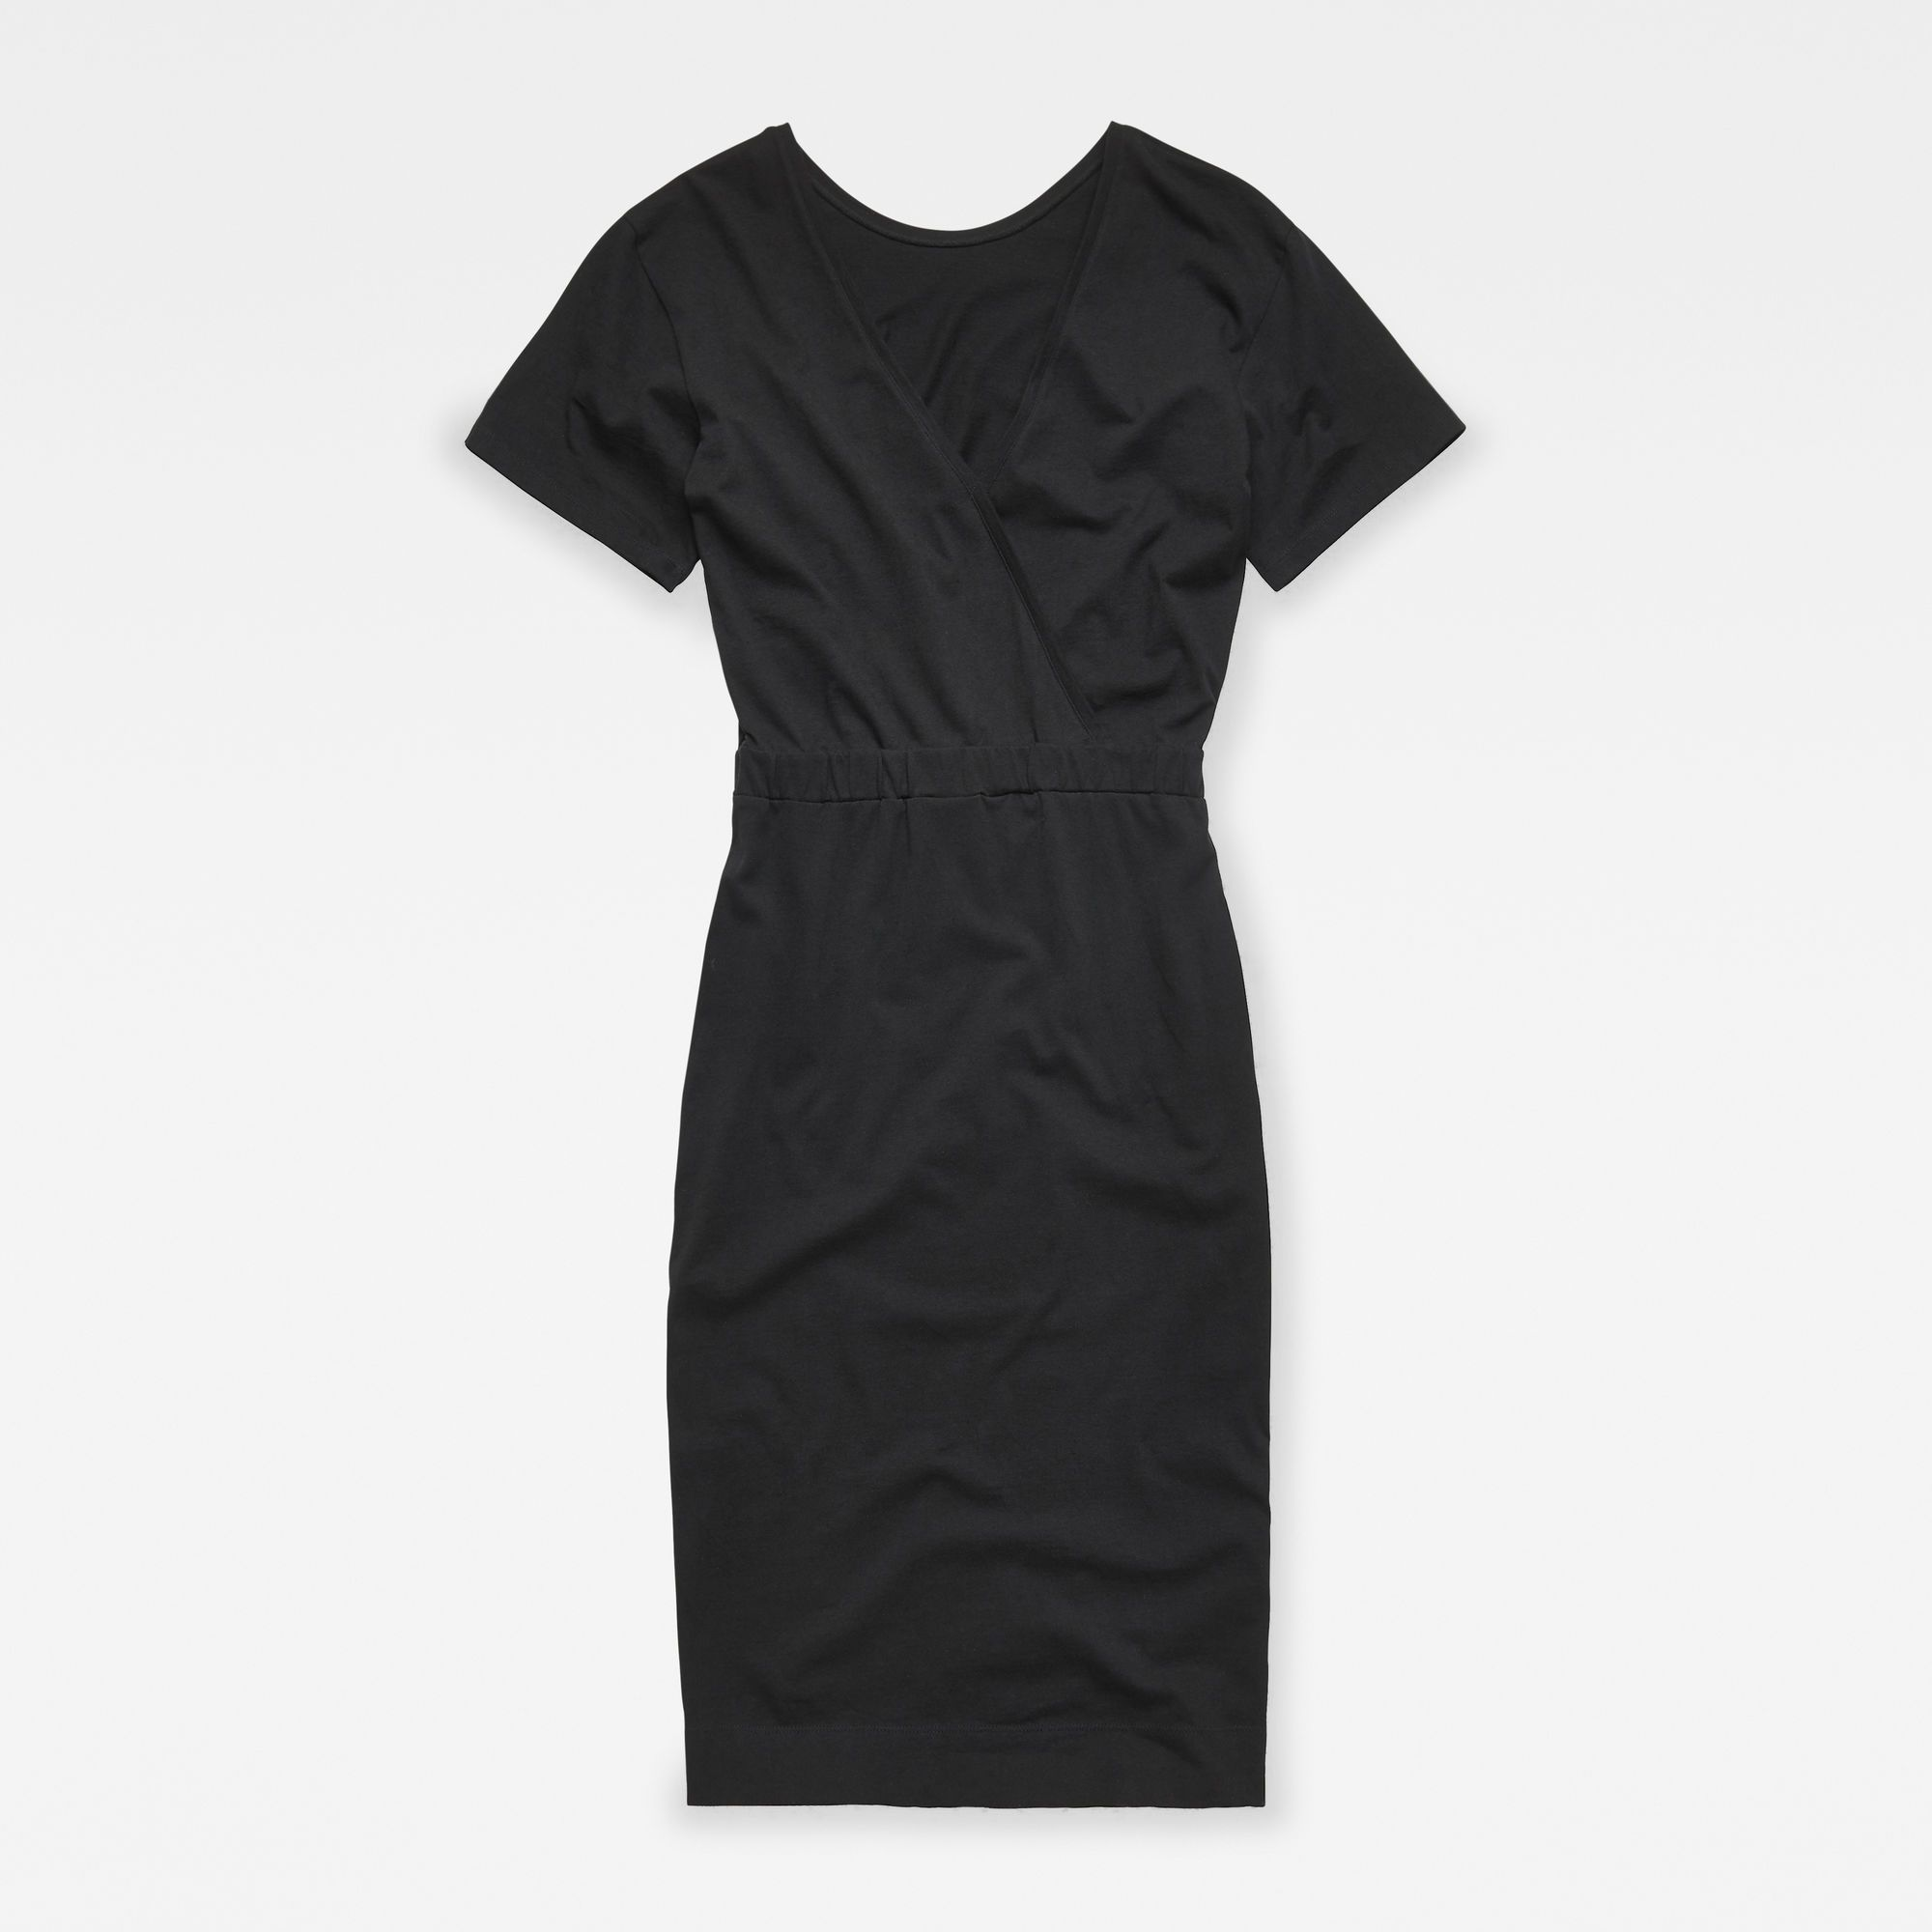 G-Star RAW Bohdana Dress